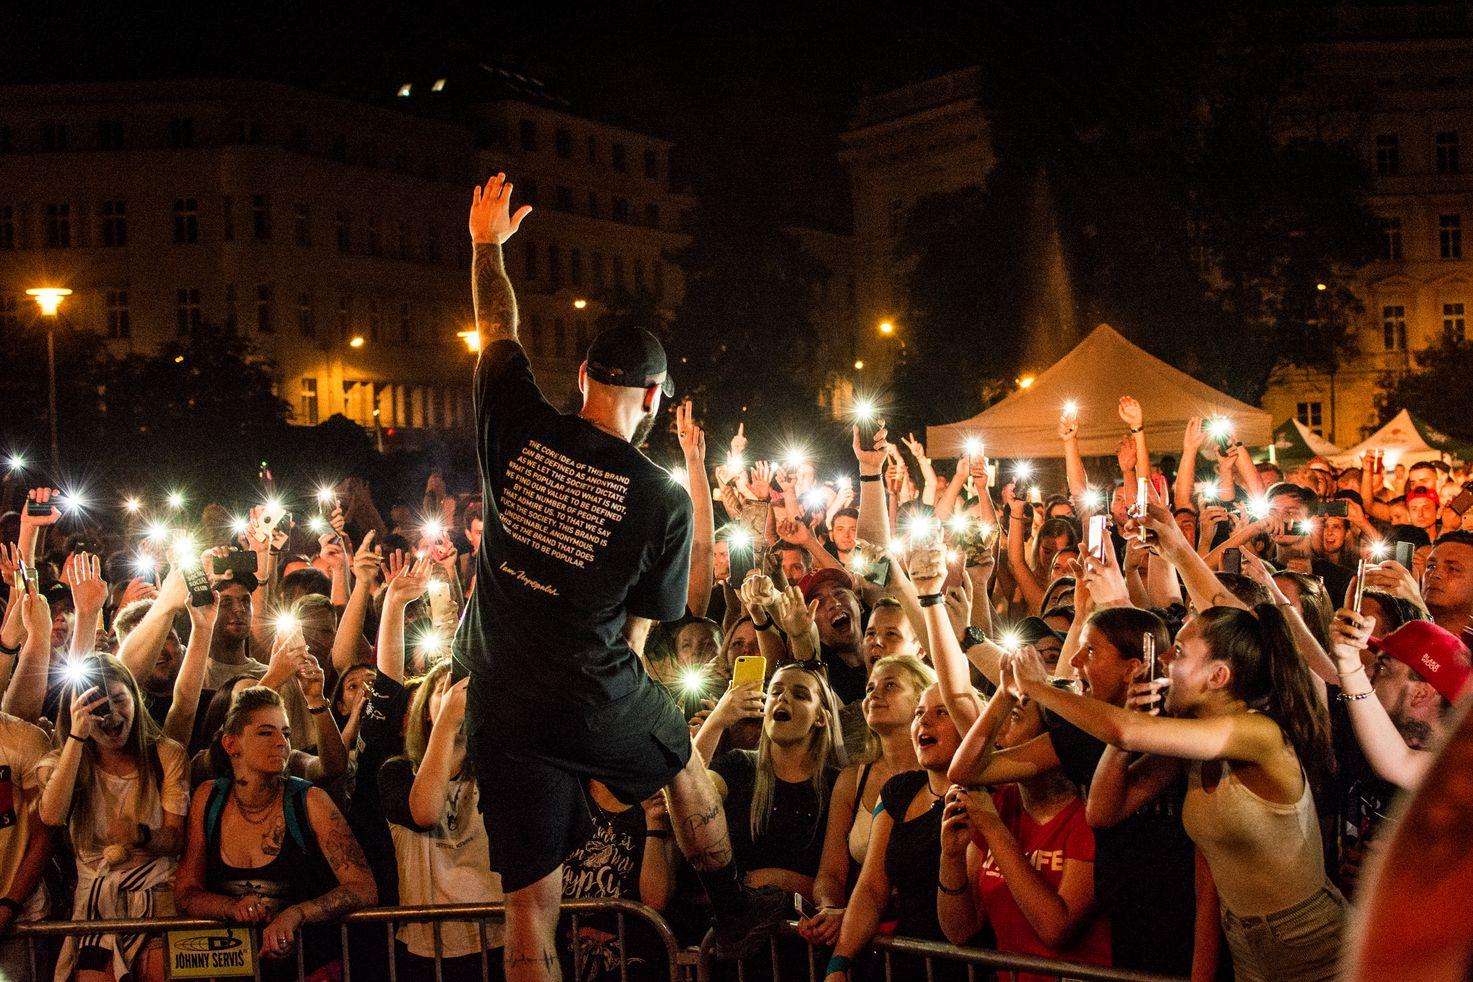 Uprostred-hiphop-srpen-Krezek-Jaroslav-10-.JPG